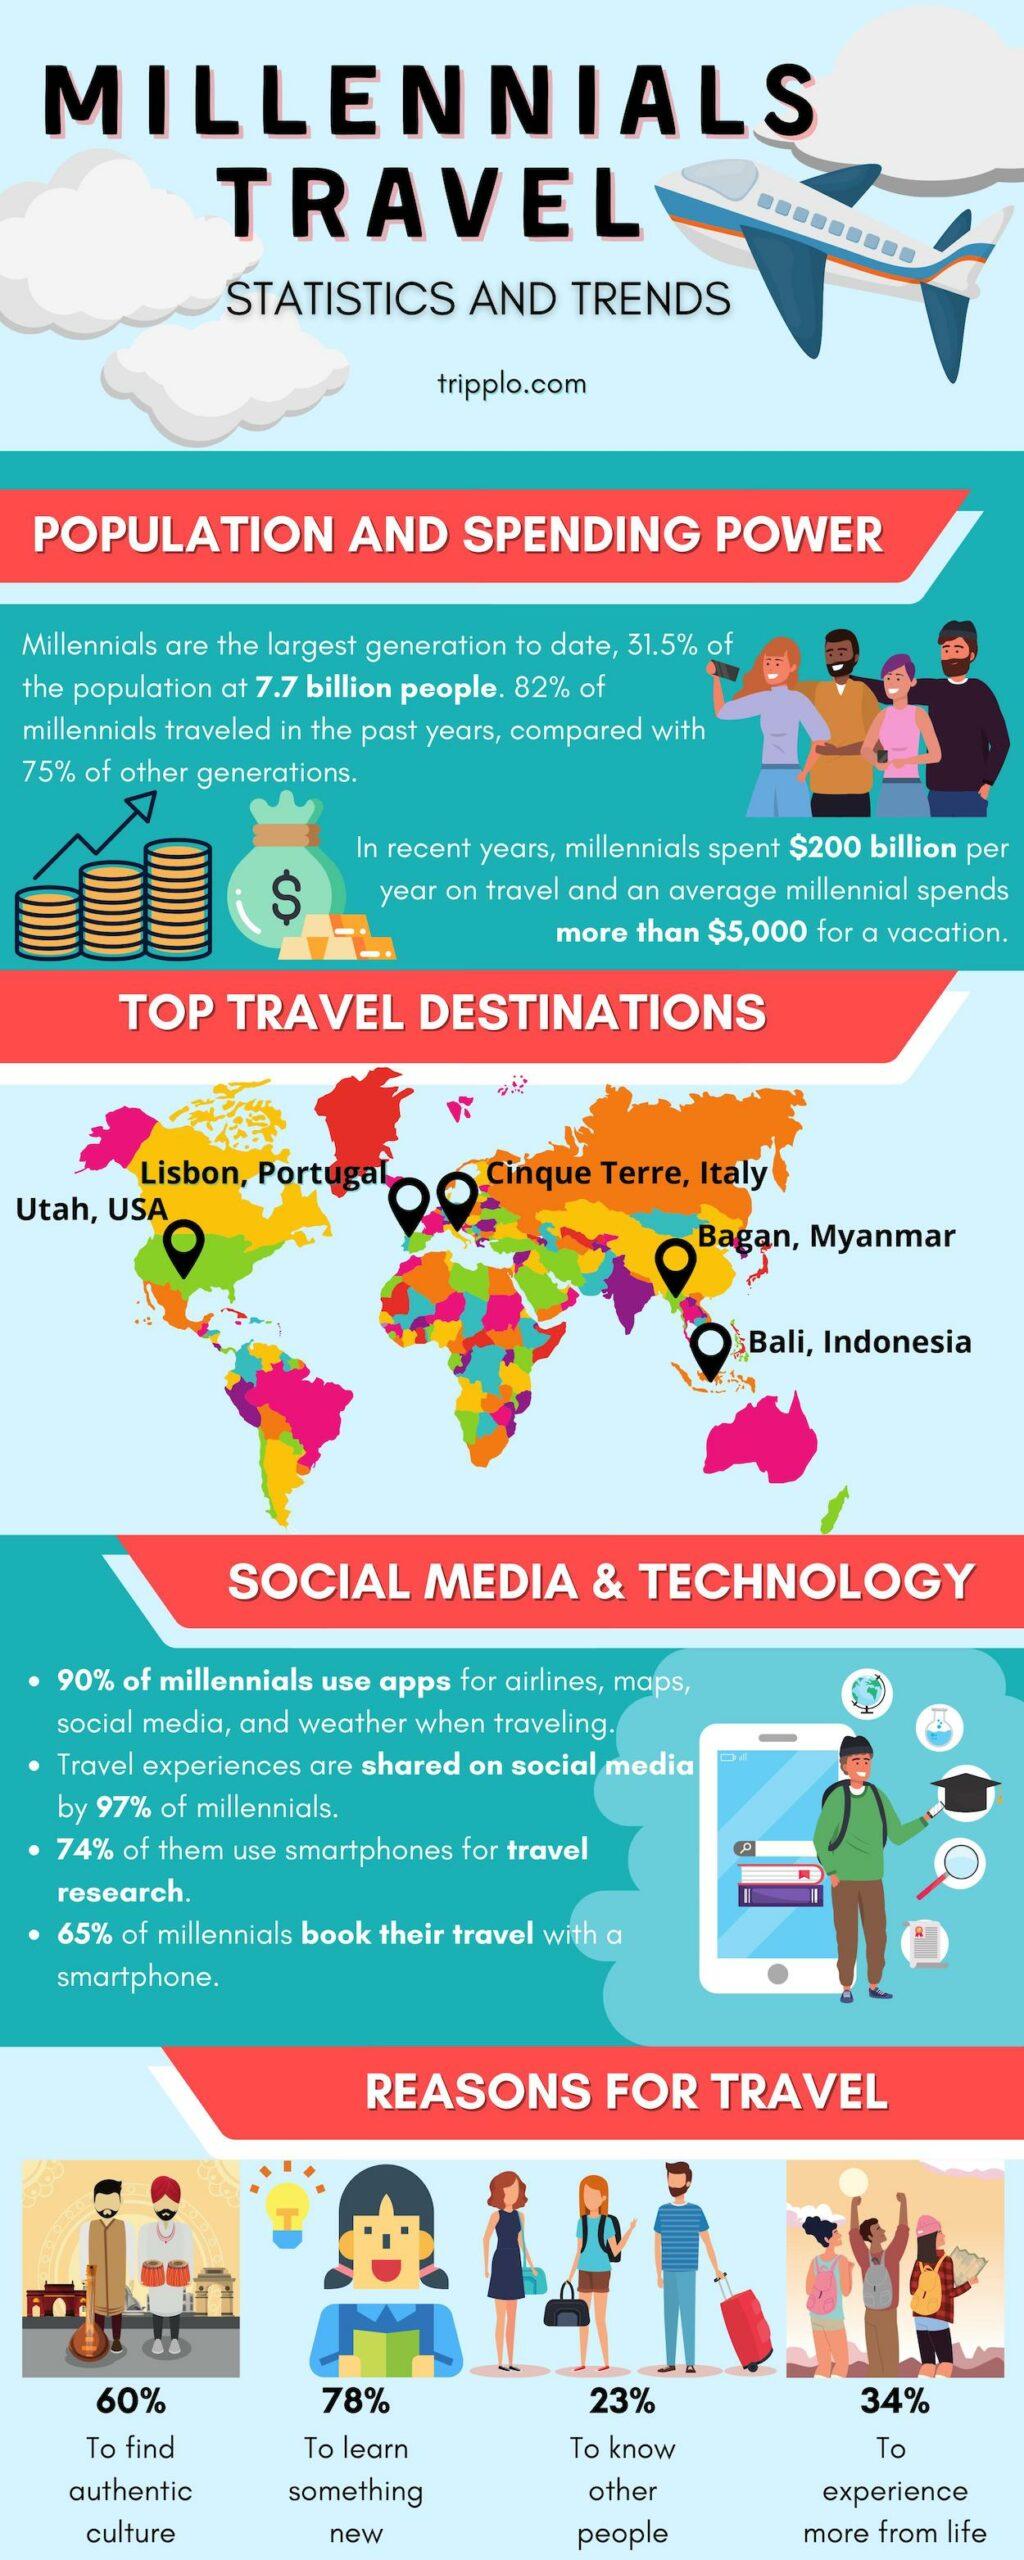 Millennials travel statistics and trends infographic